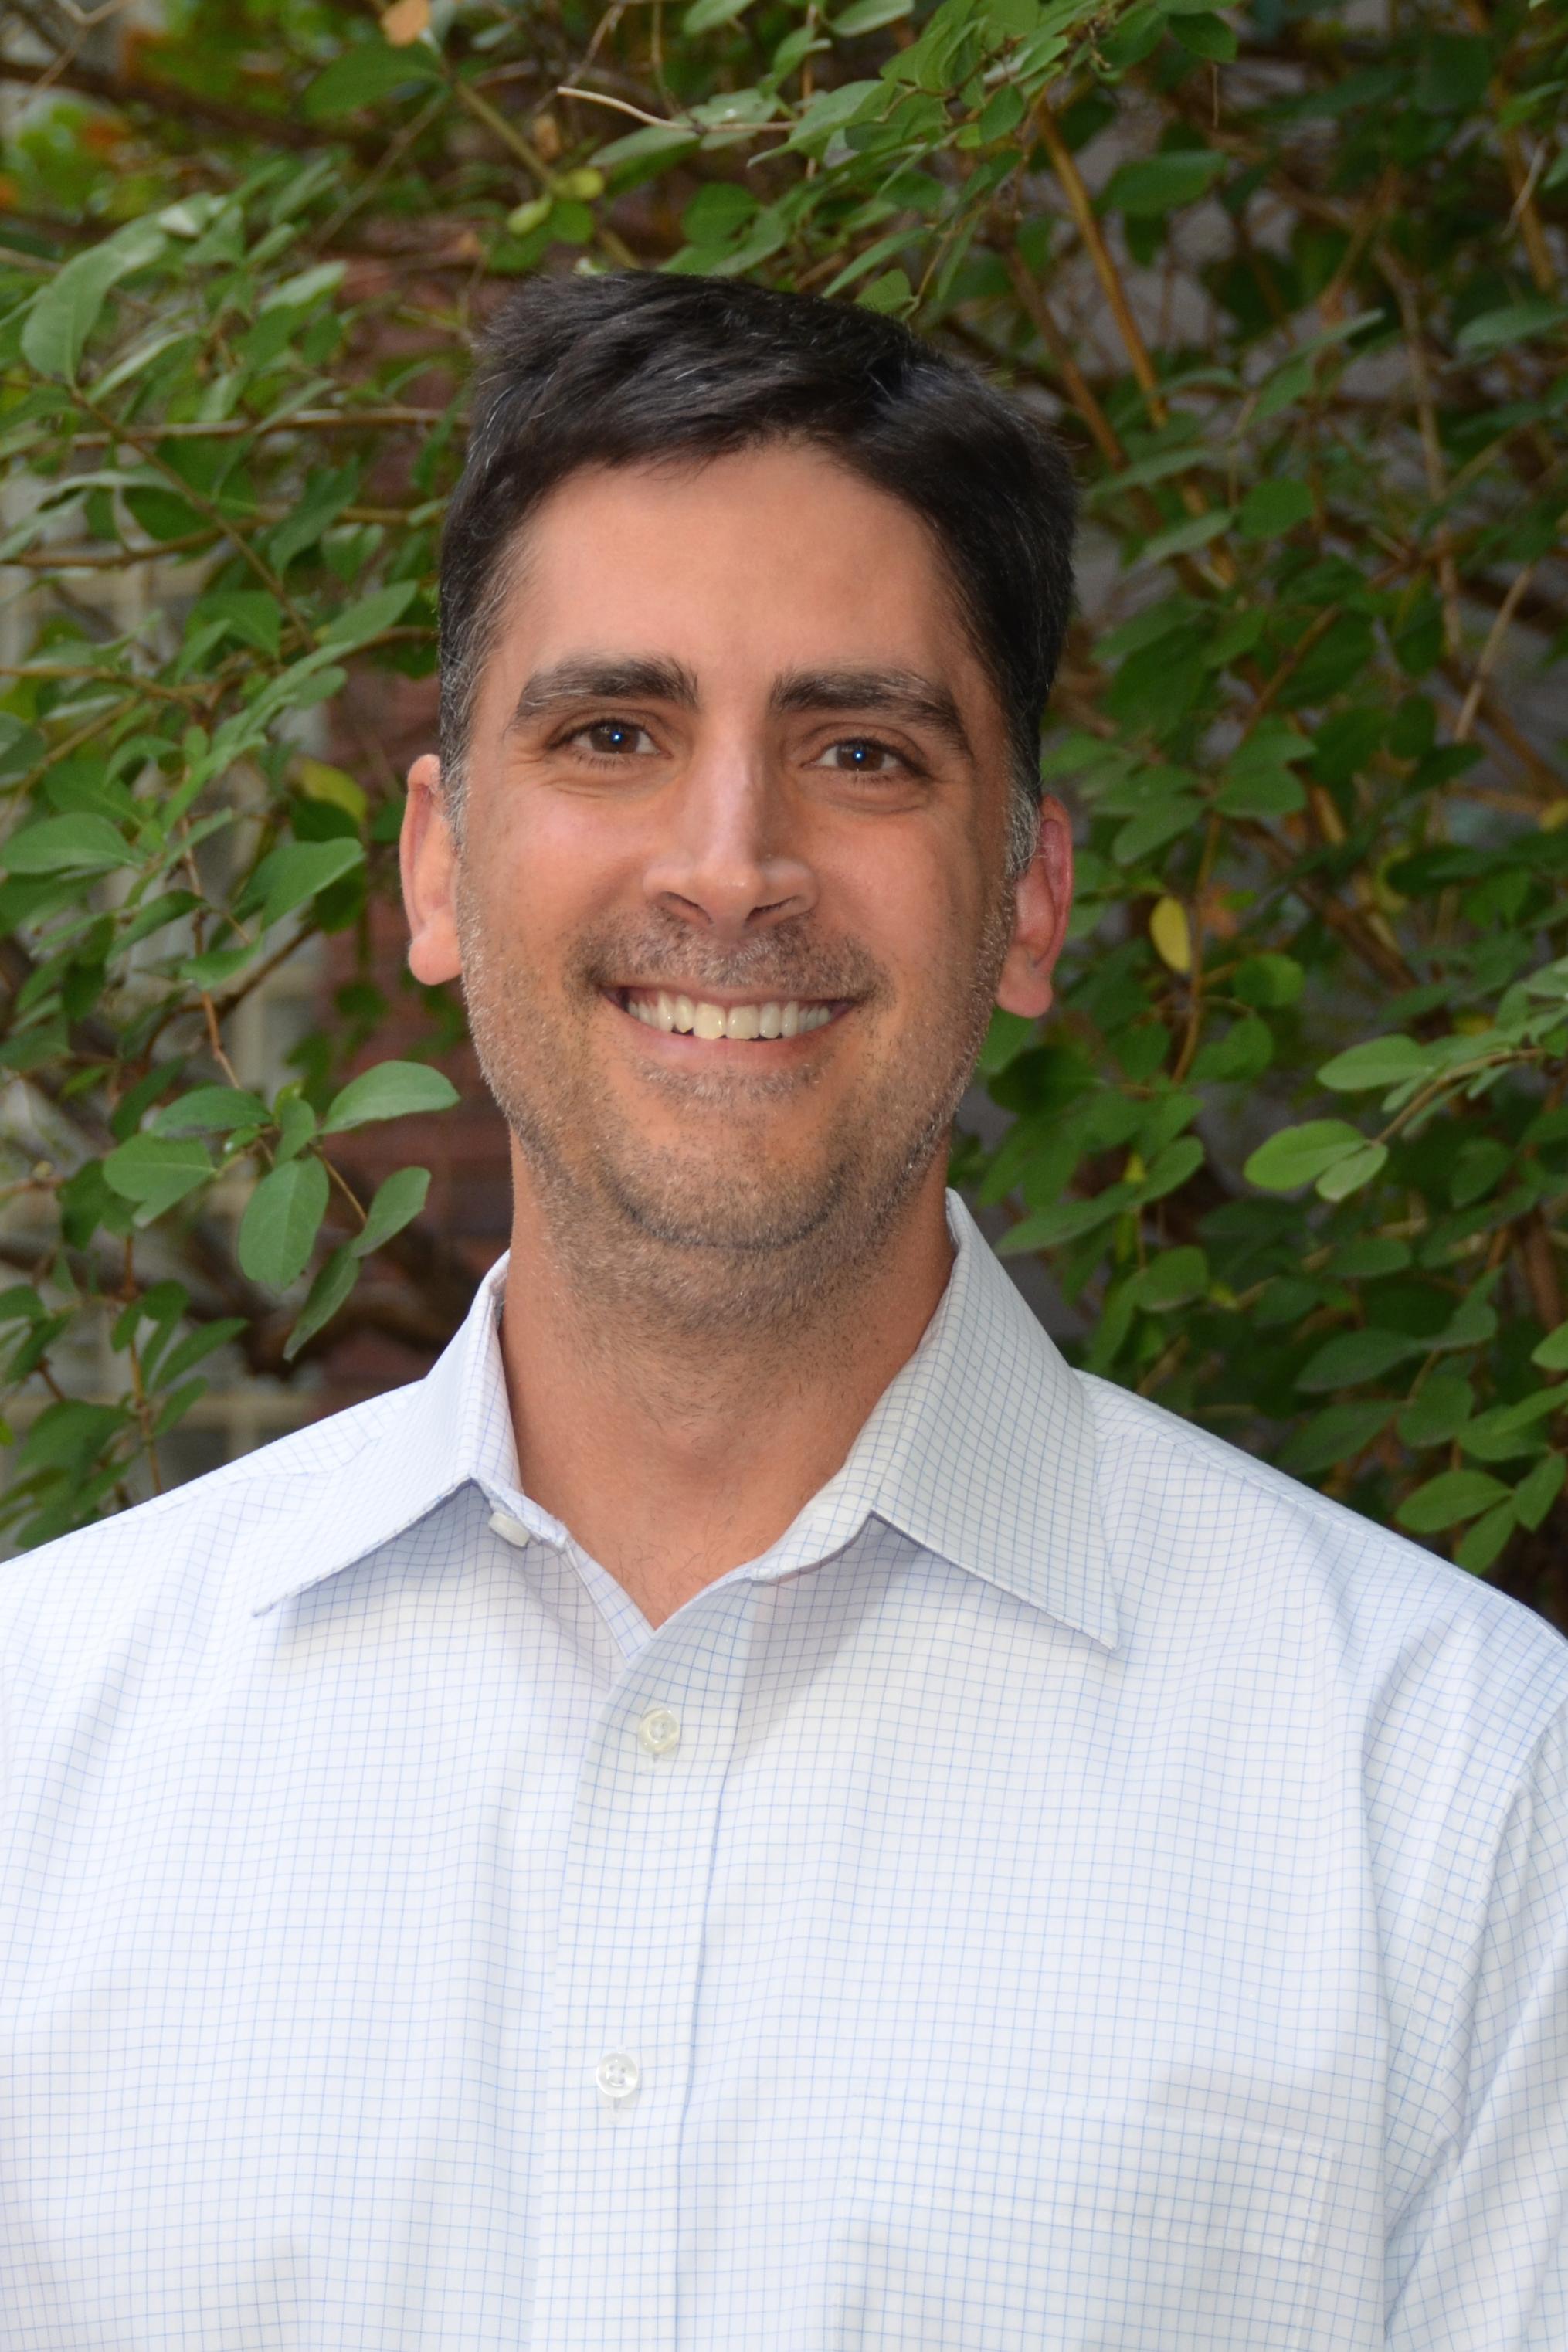 Matthew Chapman : Principle Investigator